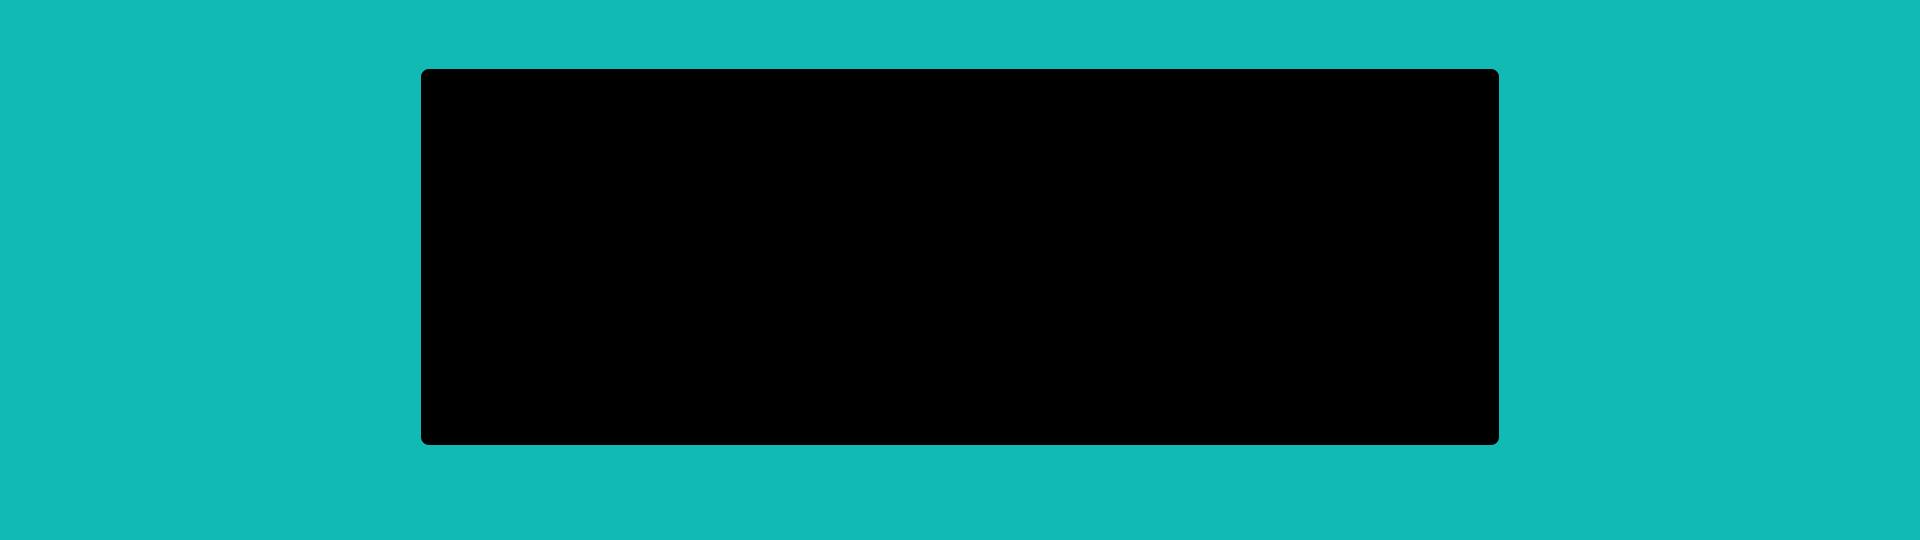 CATEGORY-TEL-KISINDIRIMITELEFONAKSESUAR-23-02